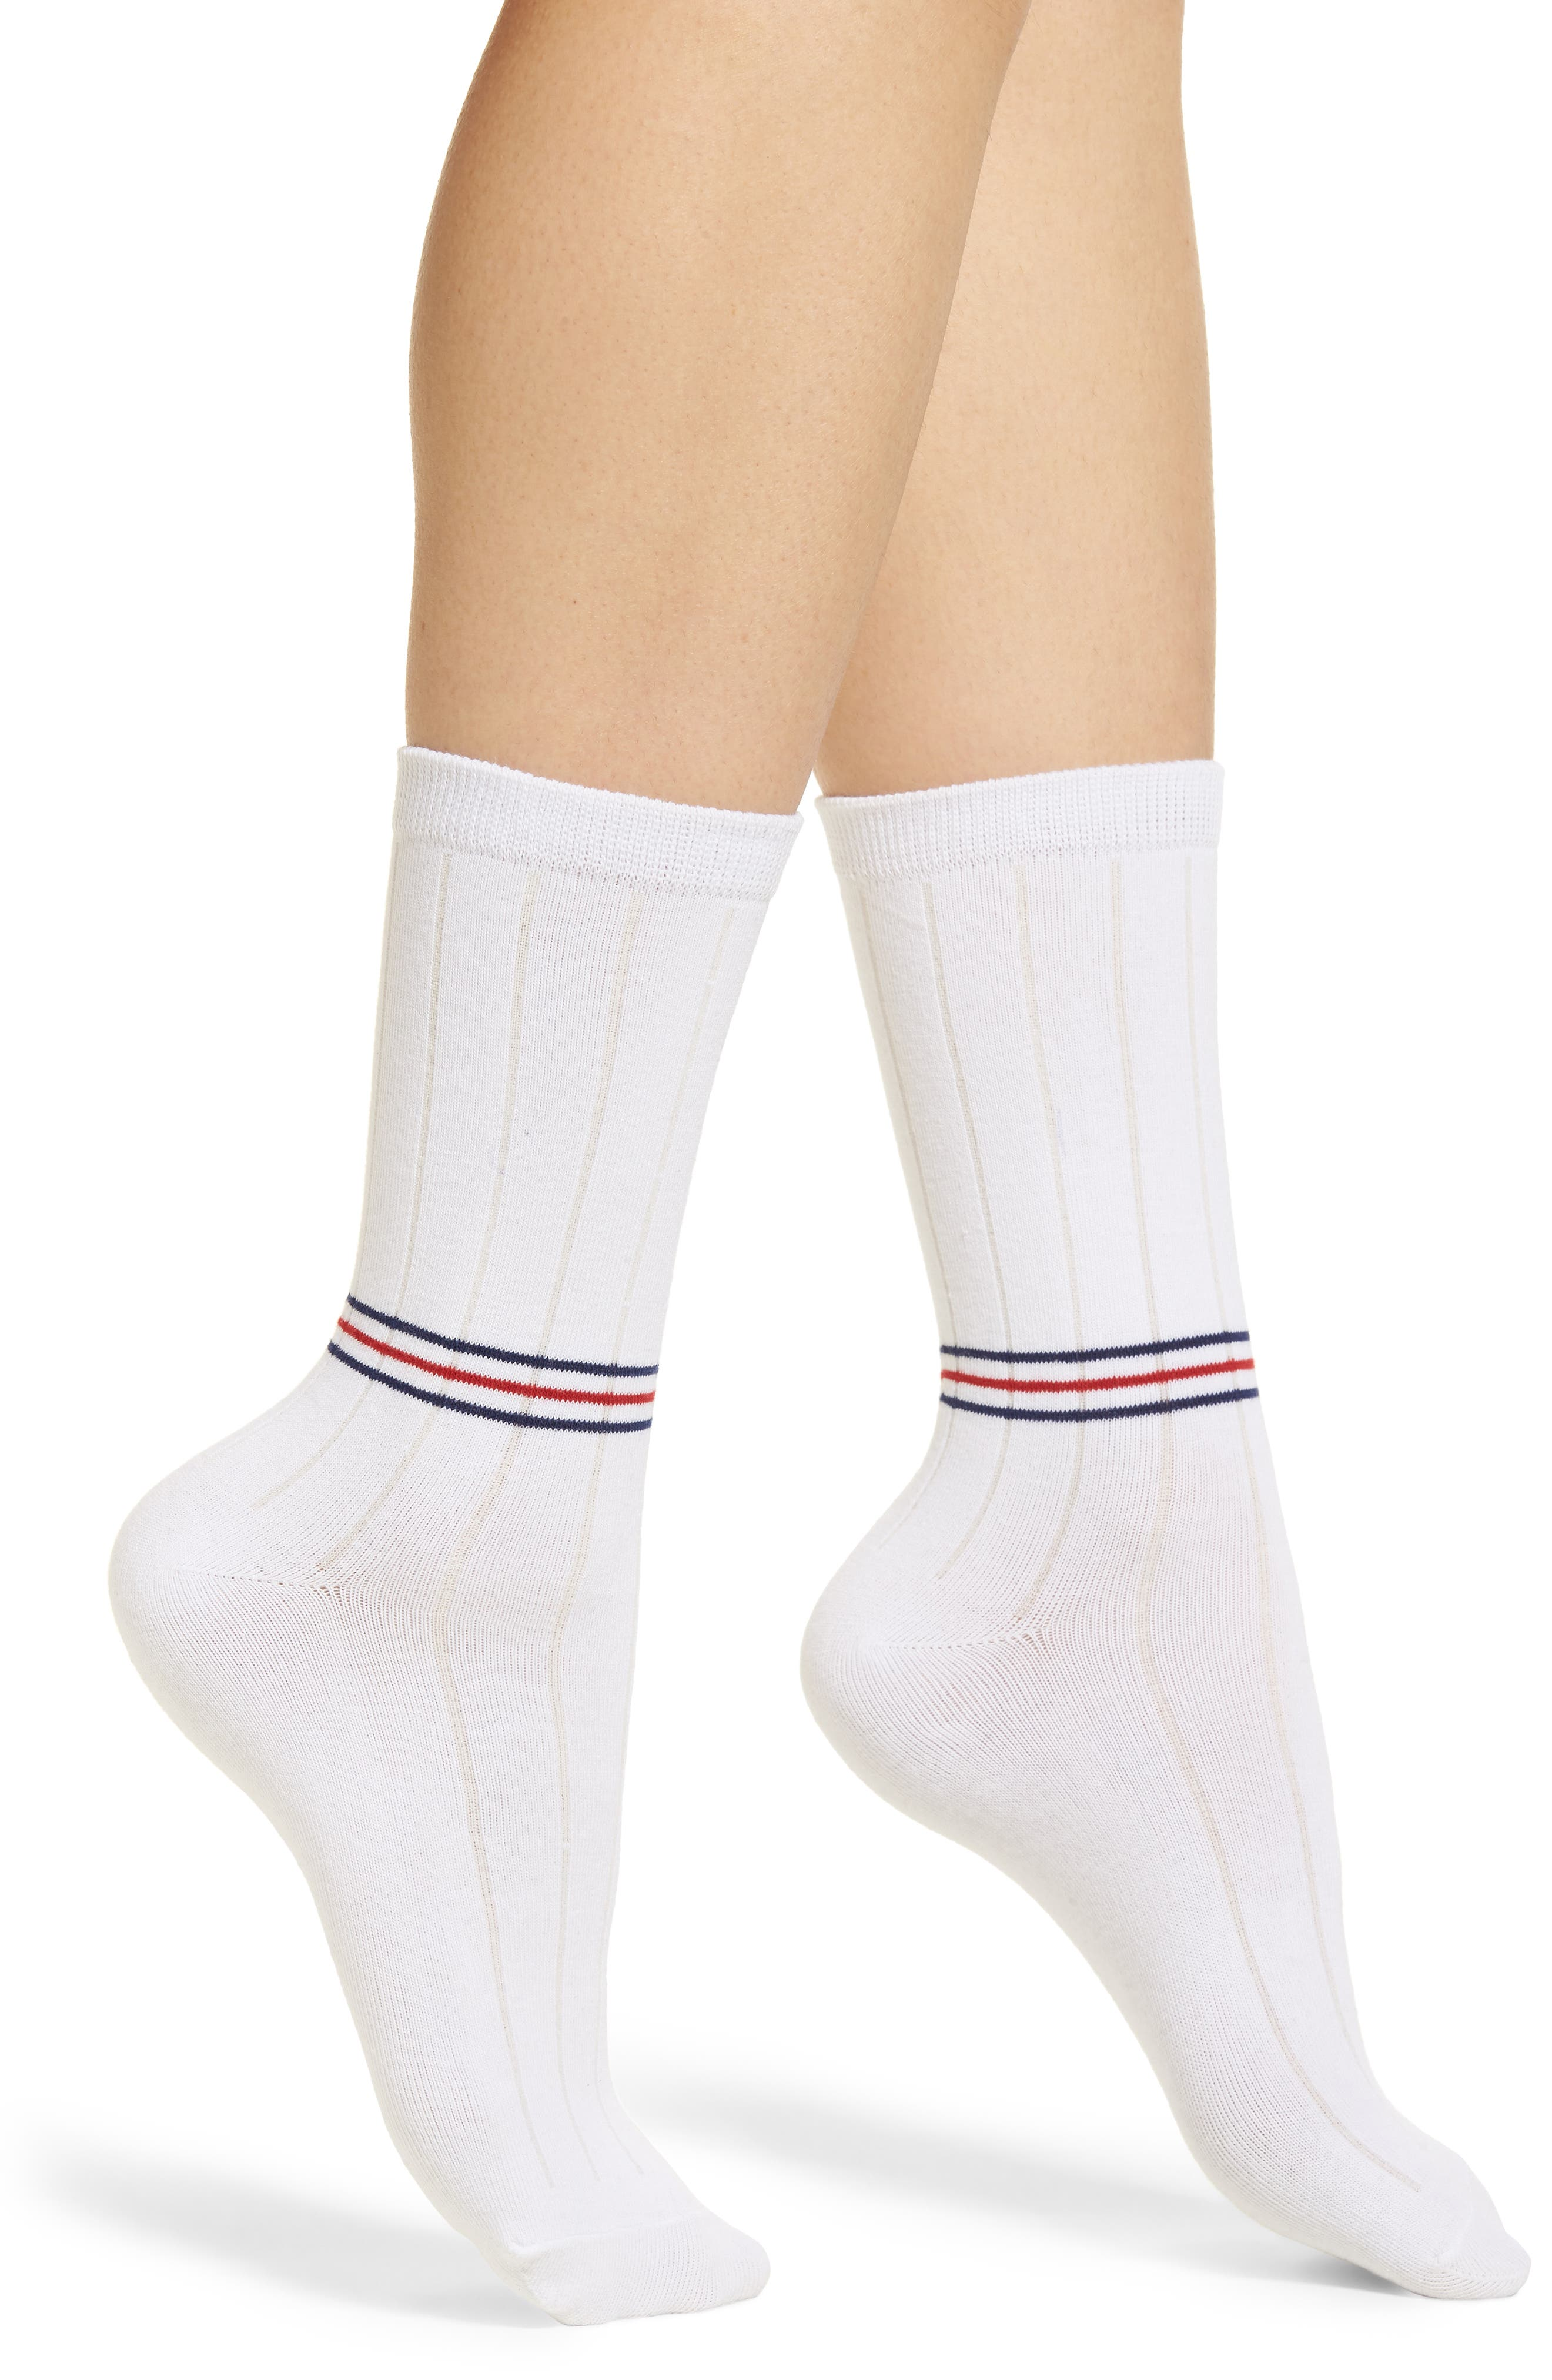 Rocky Classic Crew Socks,                             Main thumbnail 1, color,                             100